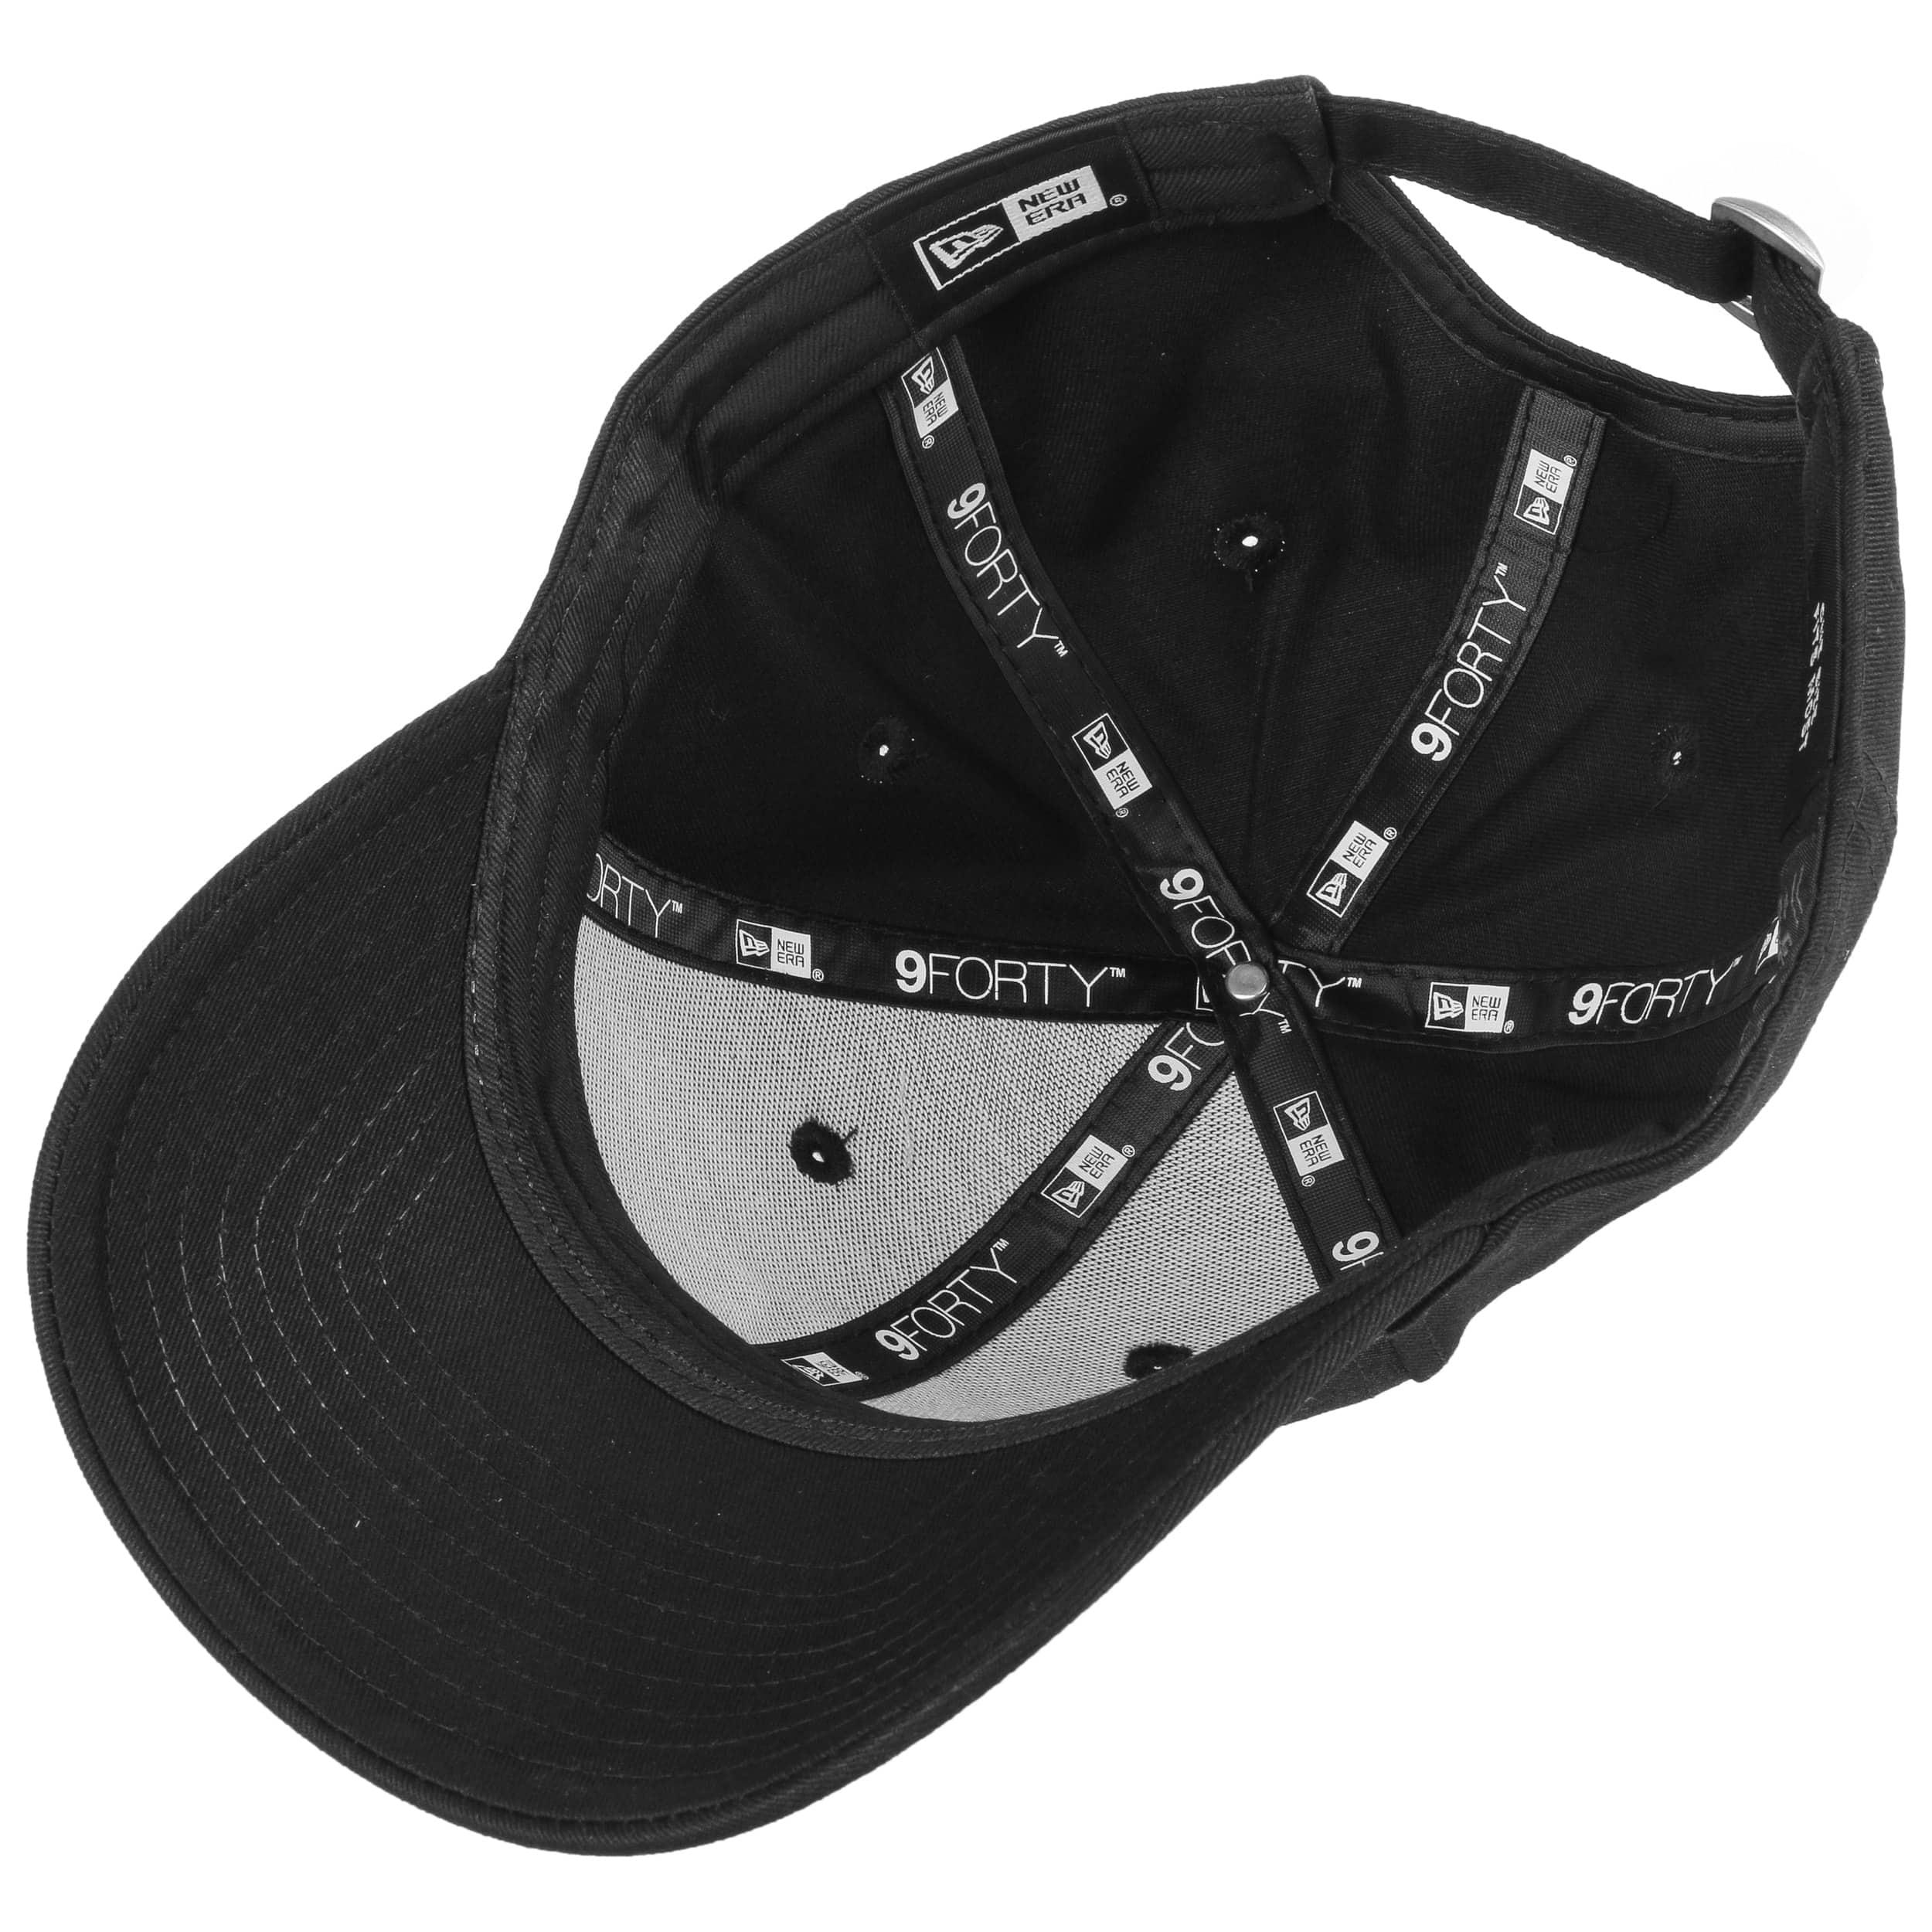 ... 9Forty League Basic Yankees Cap by New Era - nero 2 ... 2a4e5cfc8d09